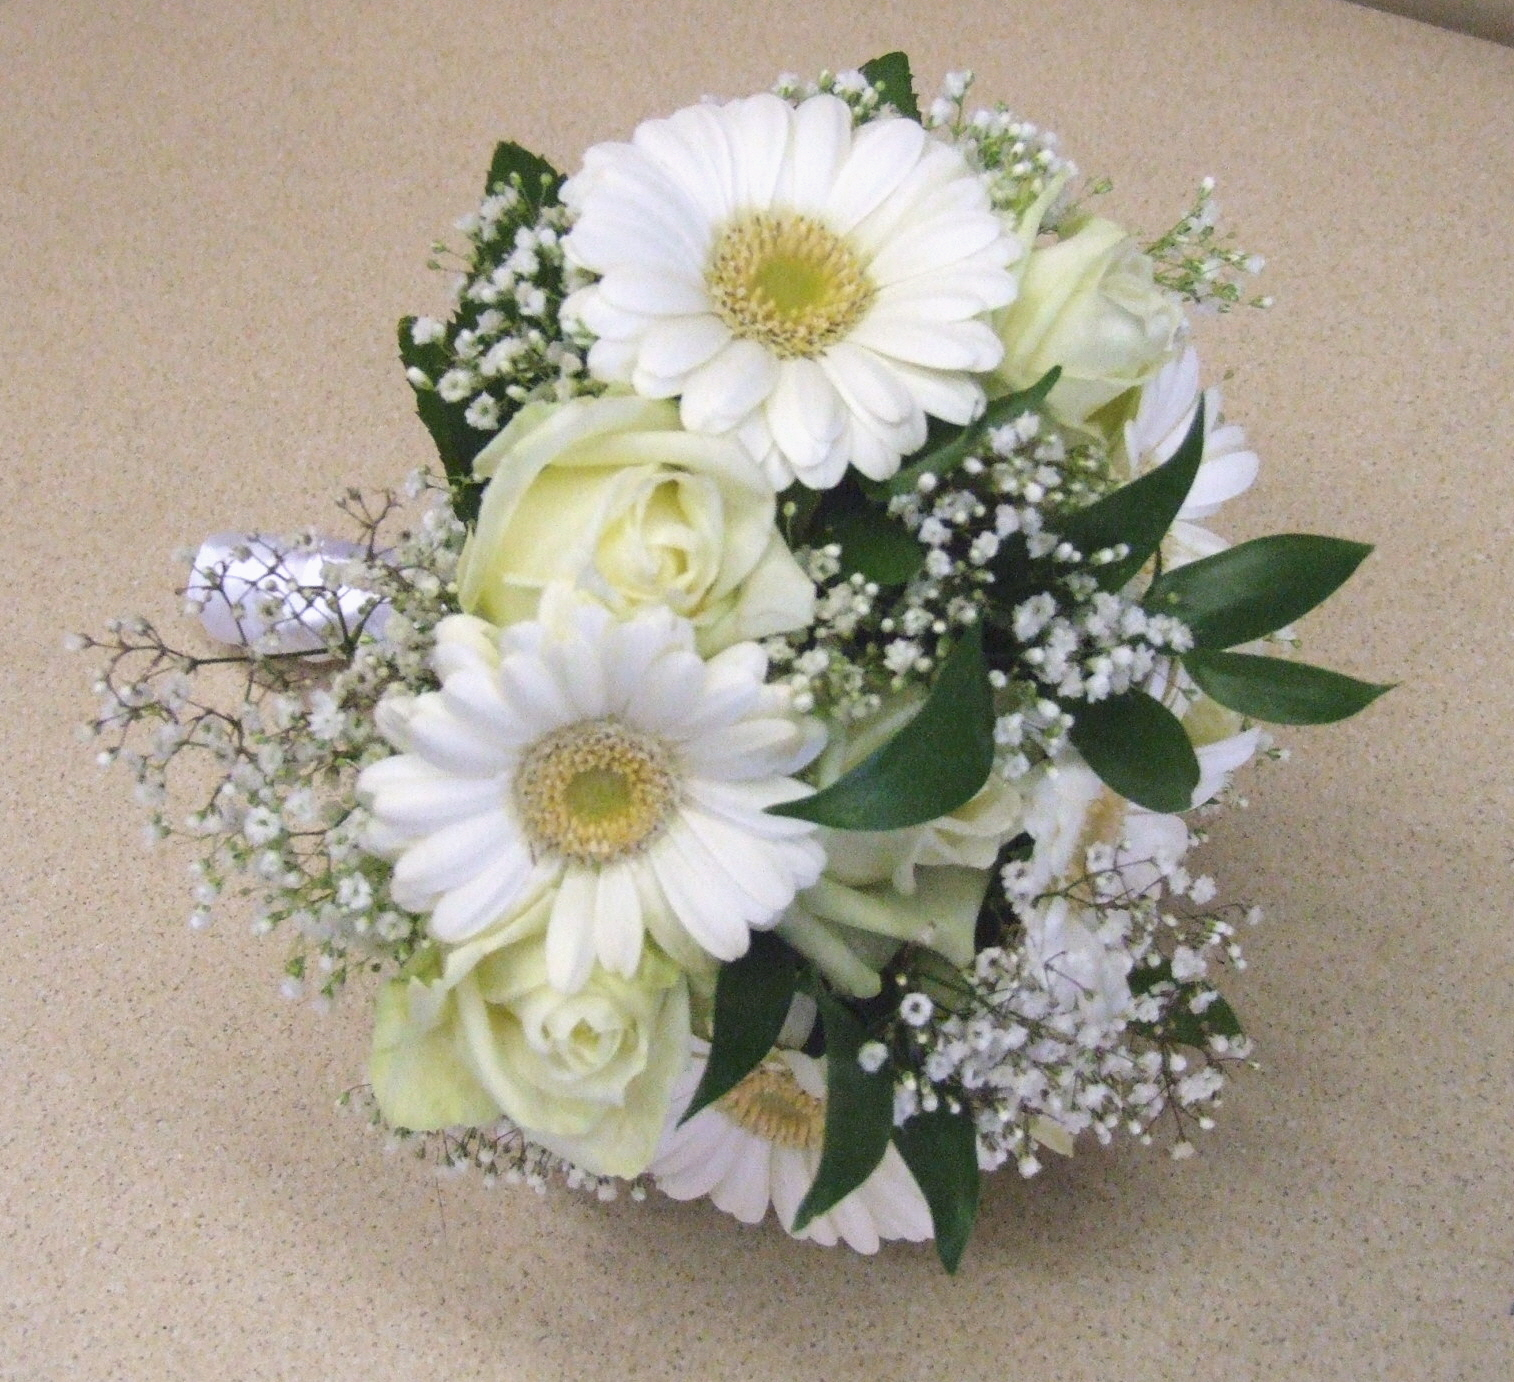 Wedding Flowers Lincoln: RJ's Florist: Rose And Germini Wedding Flowers